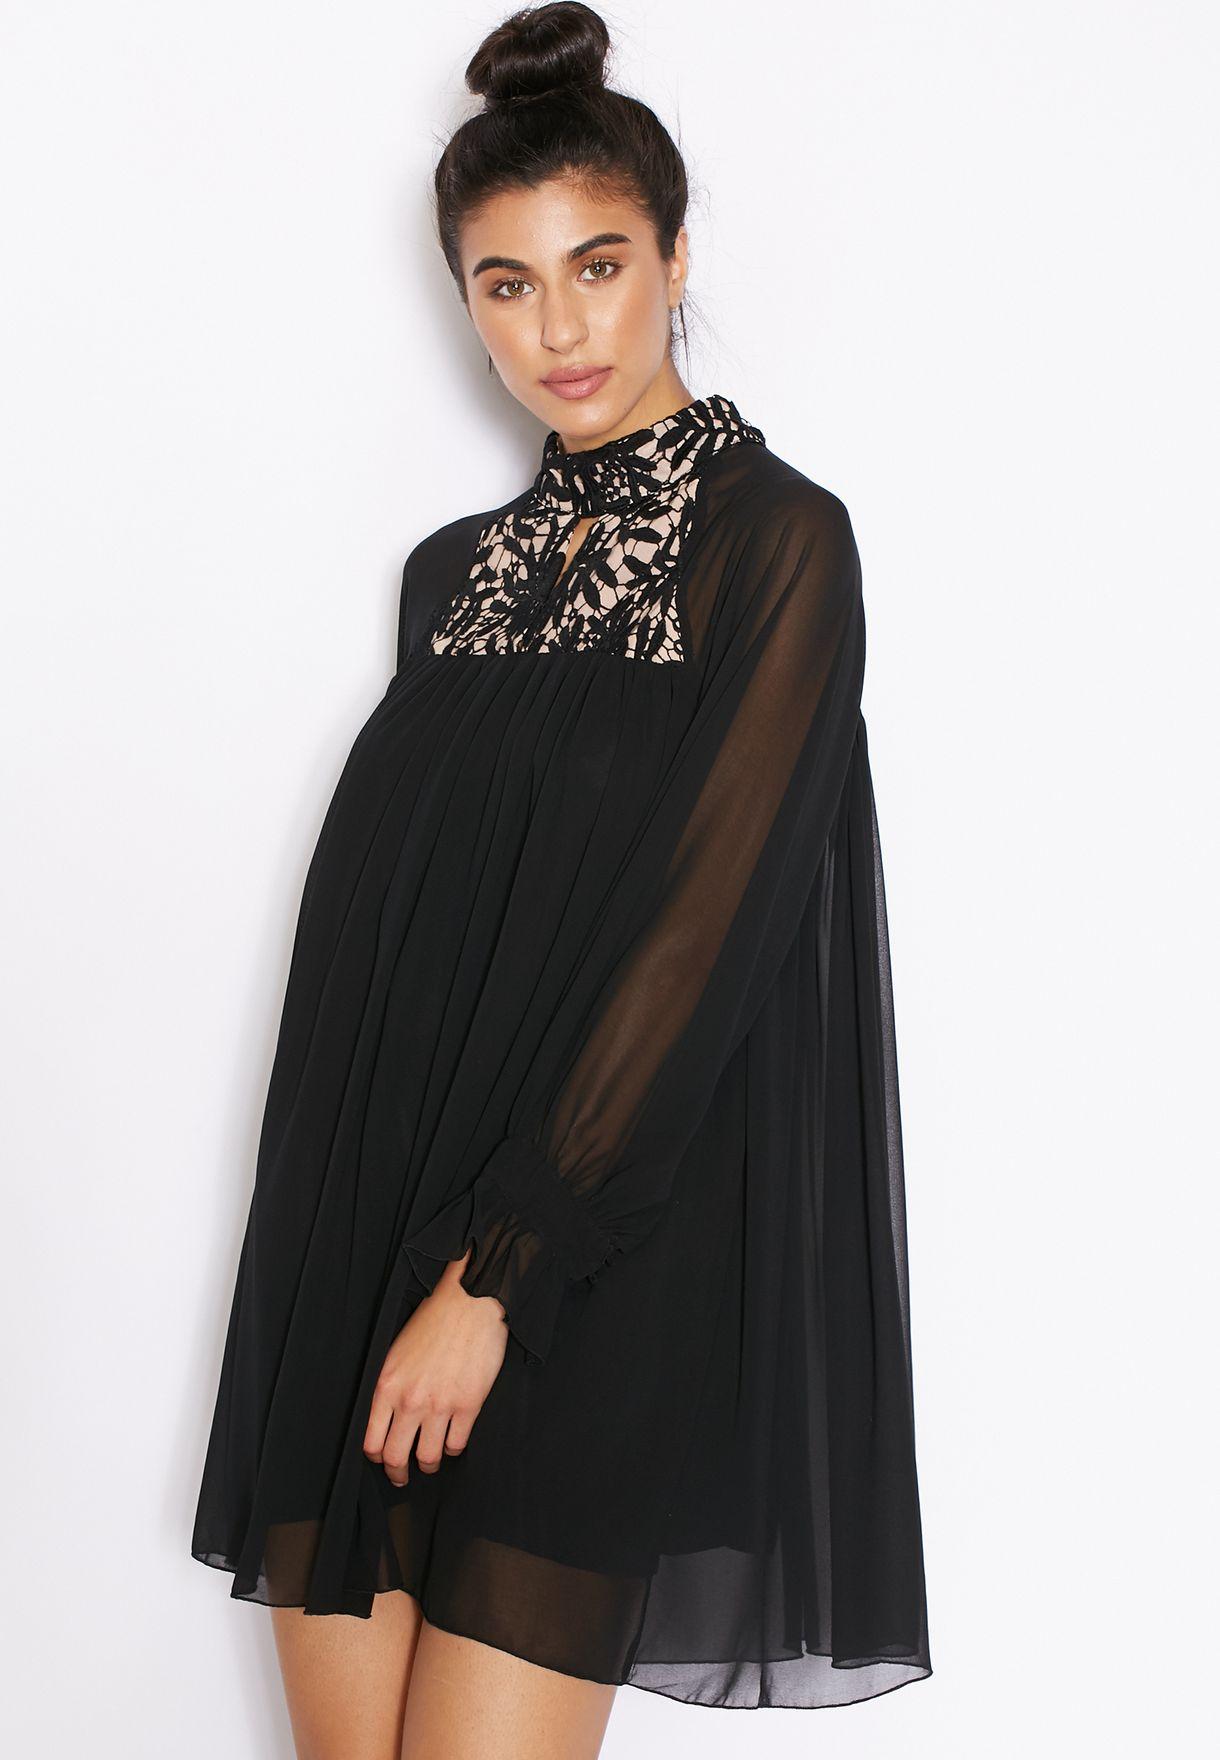 559786170e2 Shop Ginger black Lace Yoke Swing Dress for Women in Qatar - GI121AT71ZFO